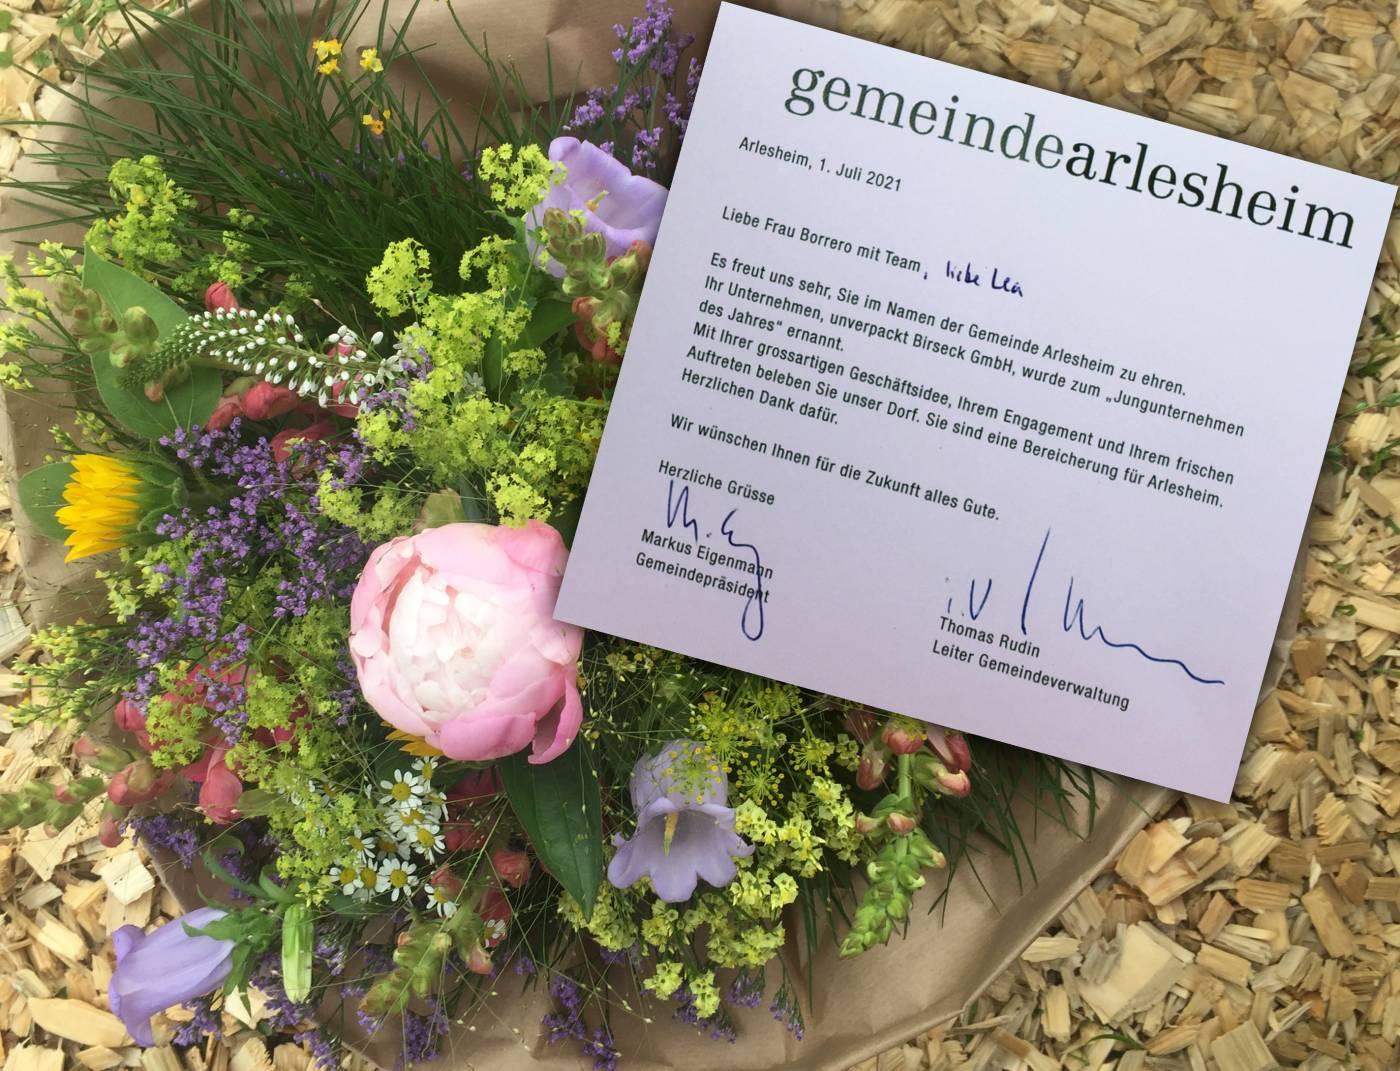 Unverpackt Birseck   Gemeinsam gegen den Verpackungswahn, der Unverpackt-Laden in Arlesheim